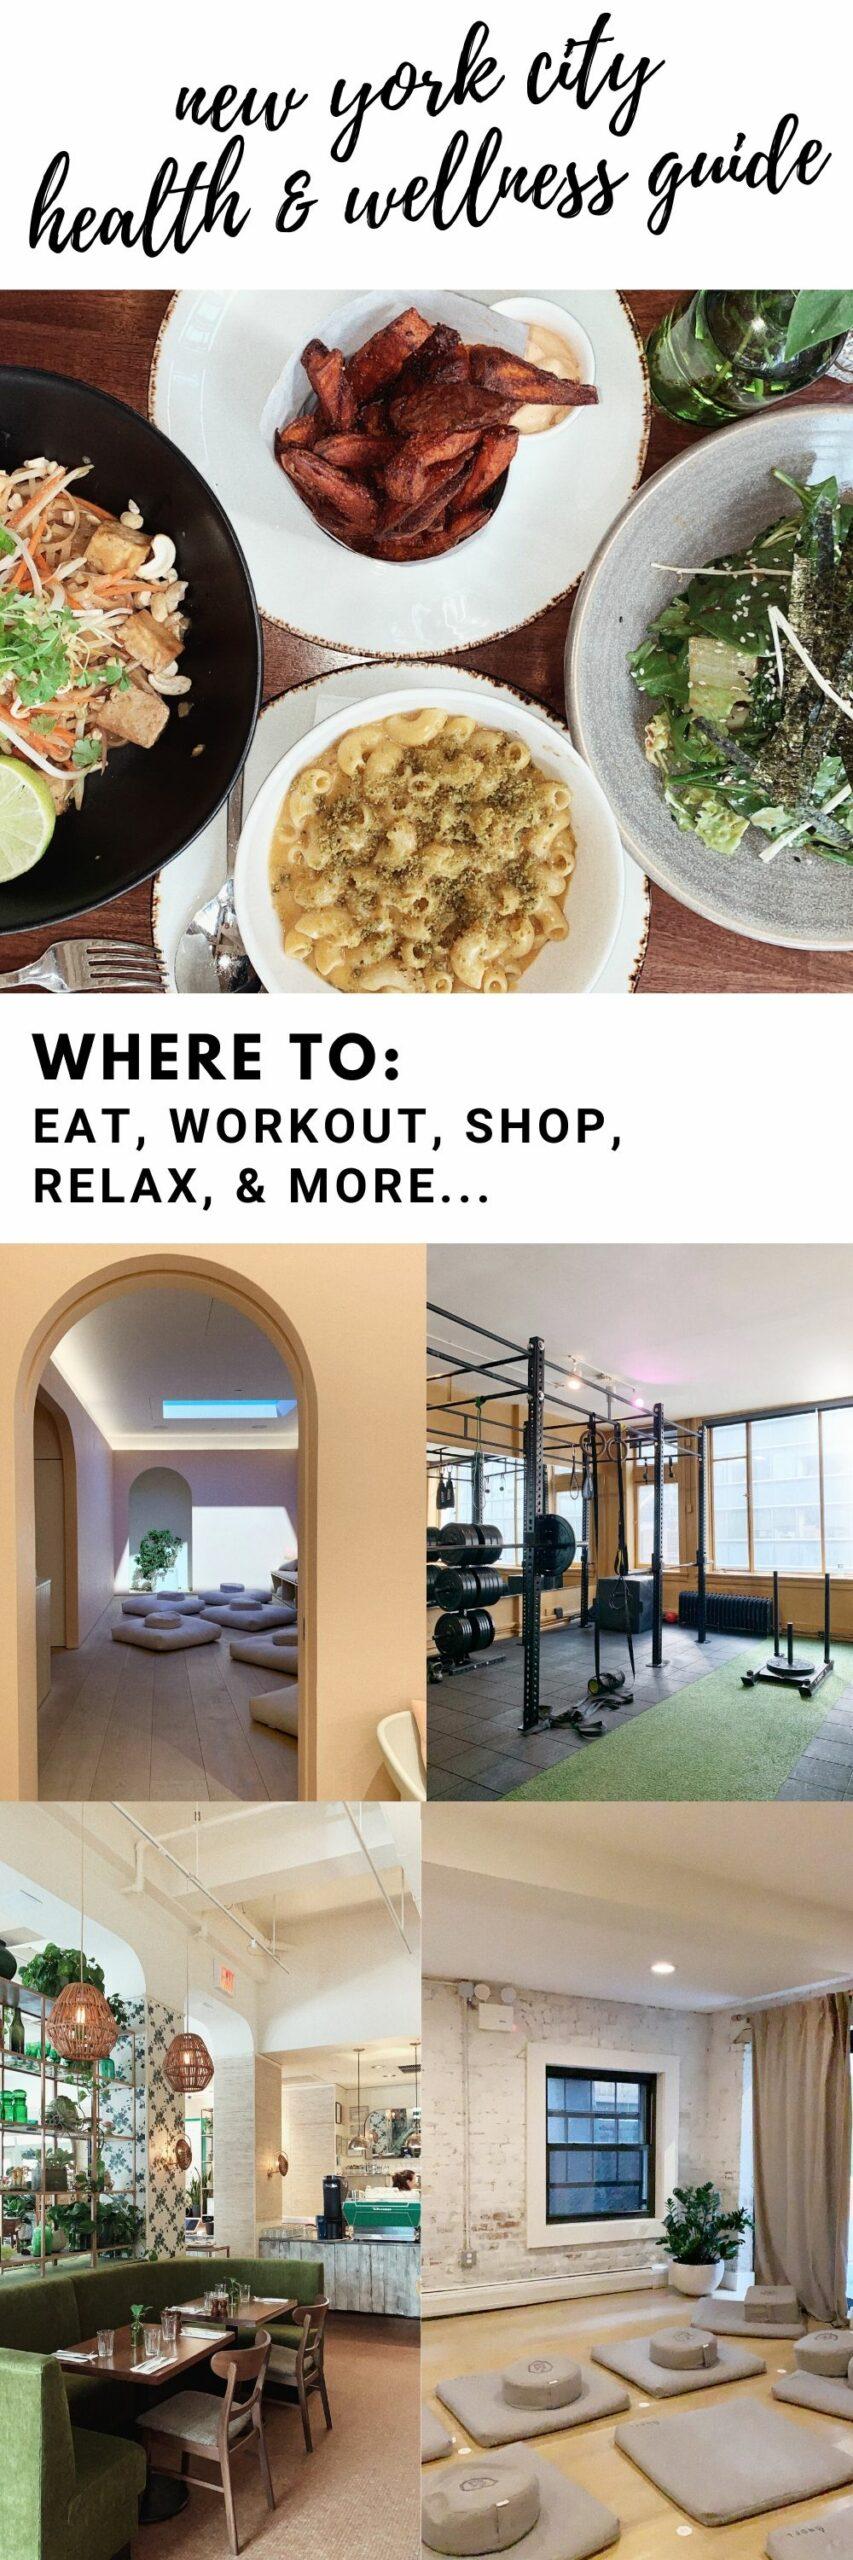 NYC Health Wellness Guide